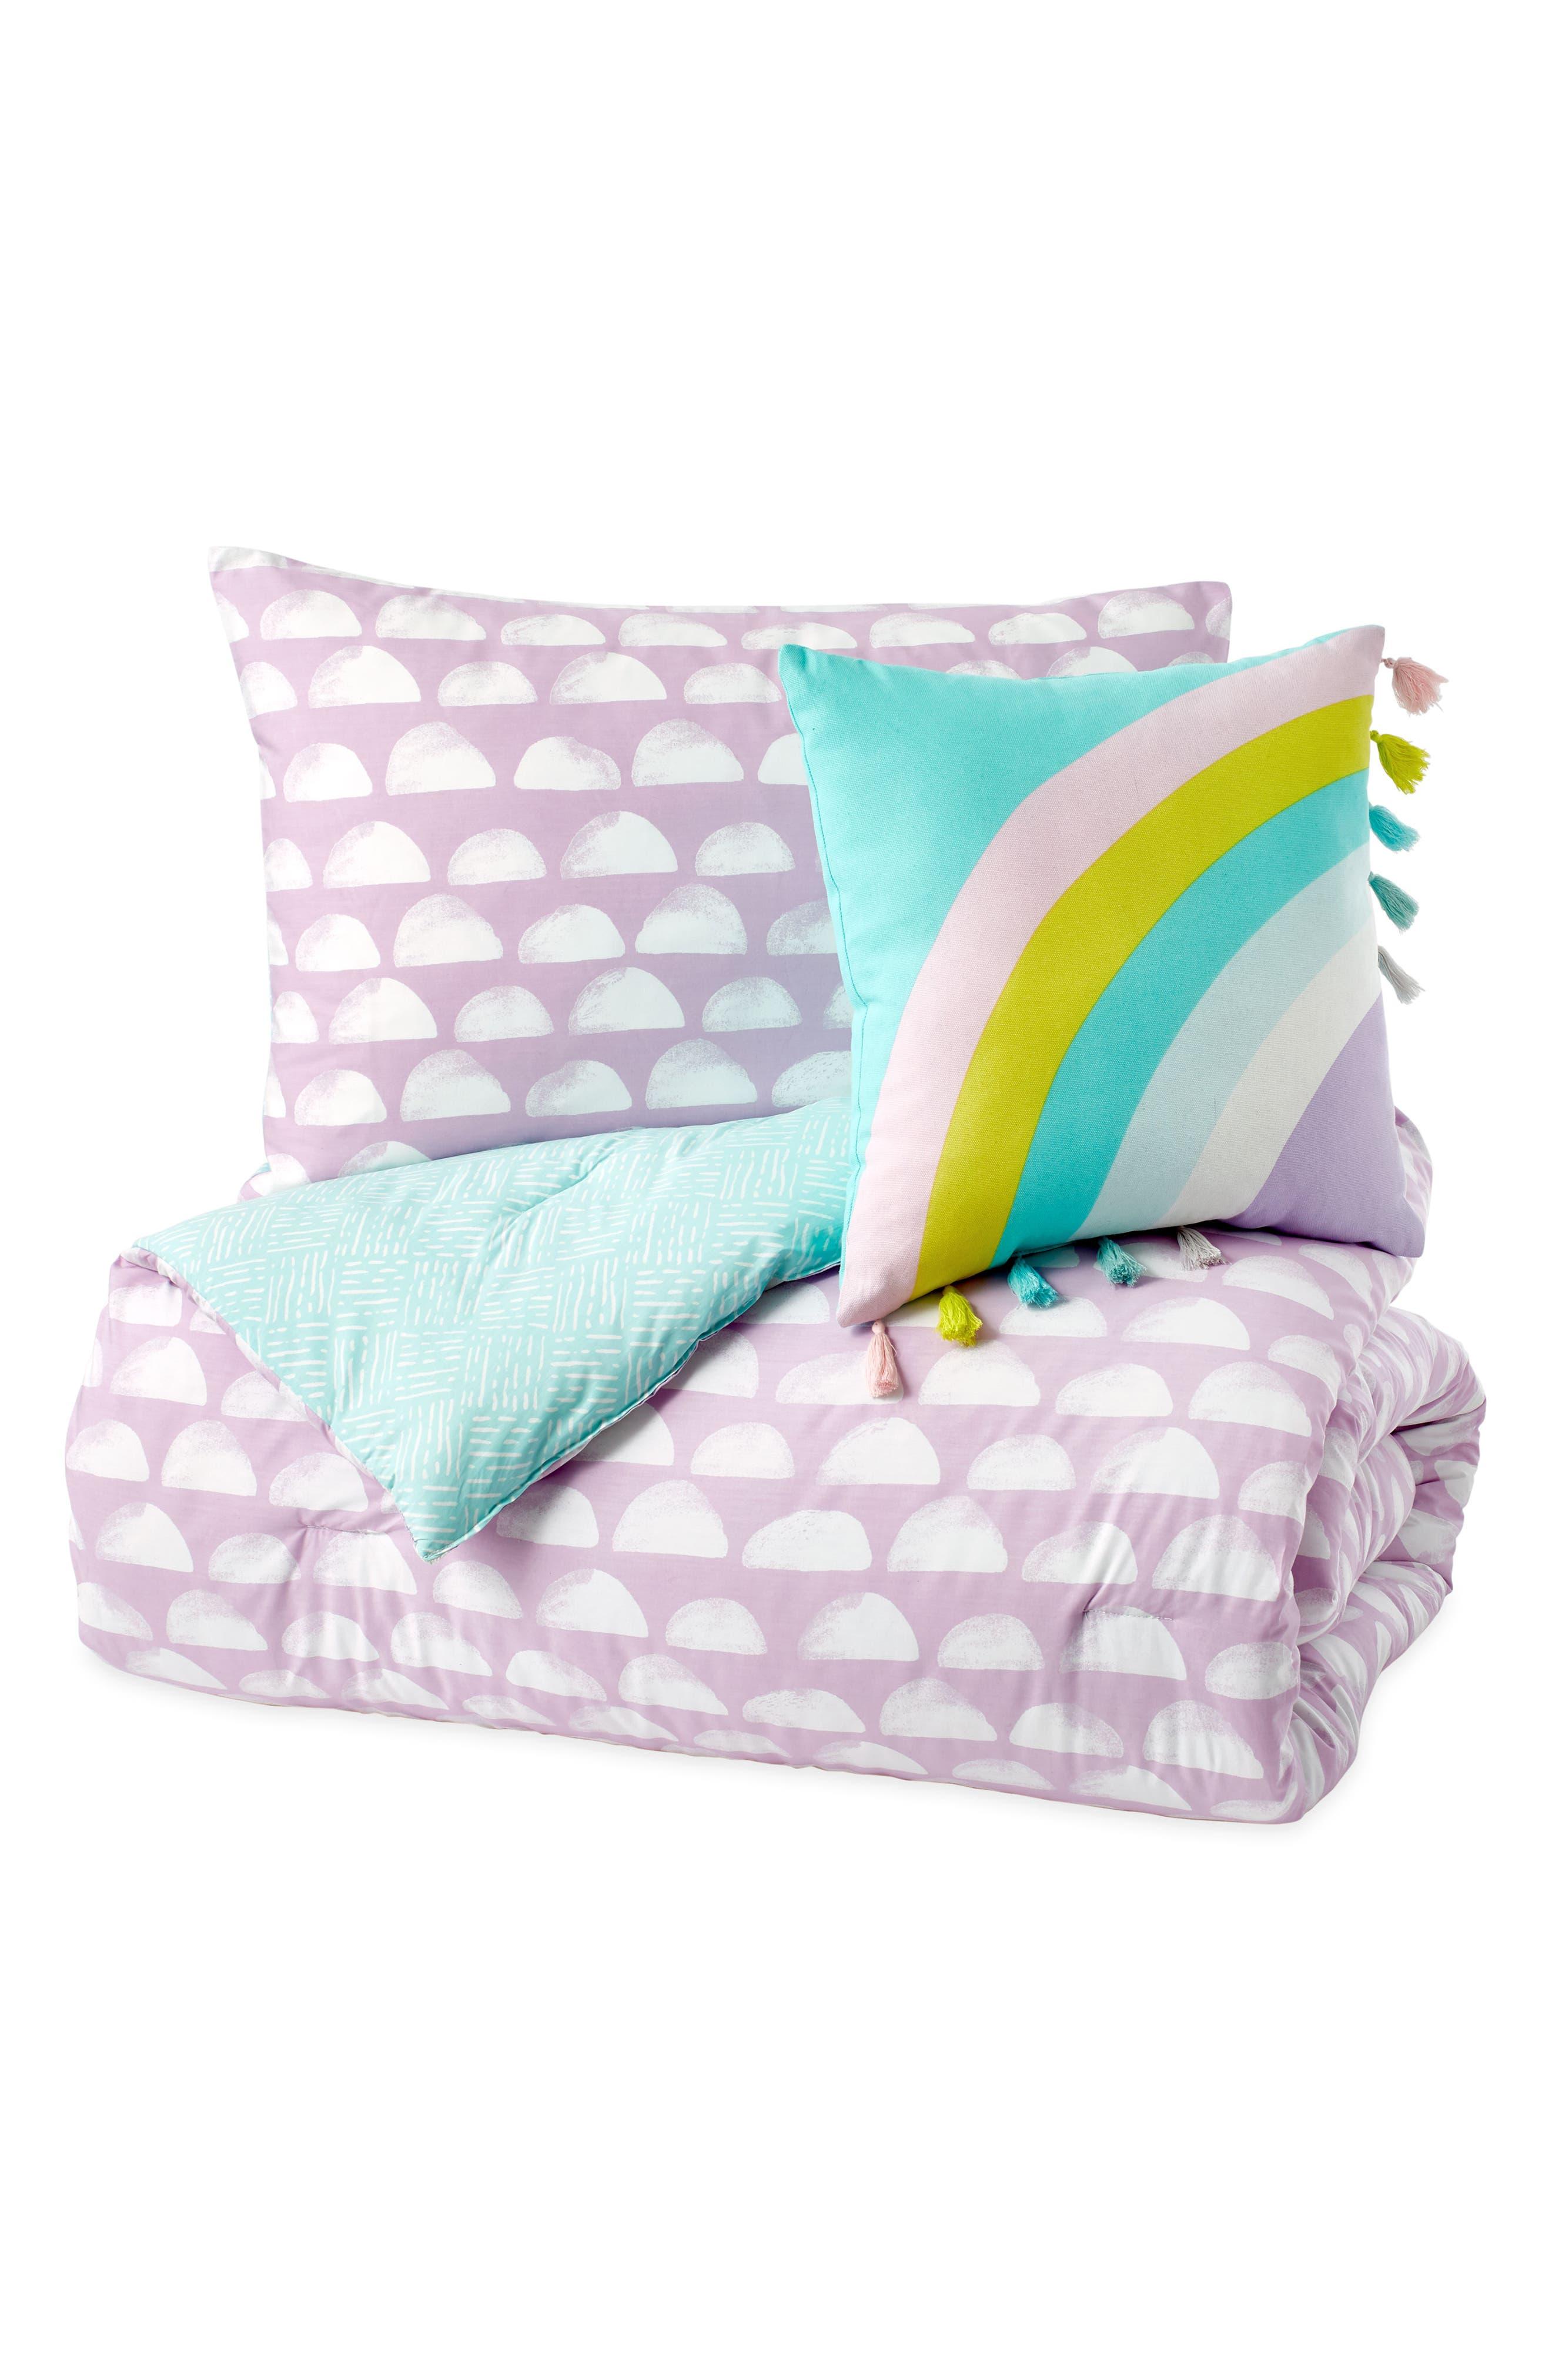 DKNY, Over the Moon Duvet, Sham & Accent Pillow Set, Alternate thumbnail 3, color, PURPLE